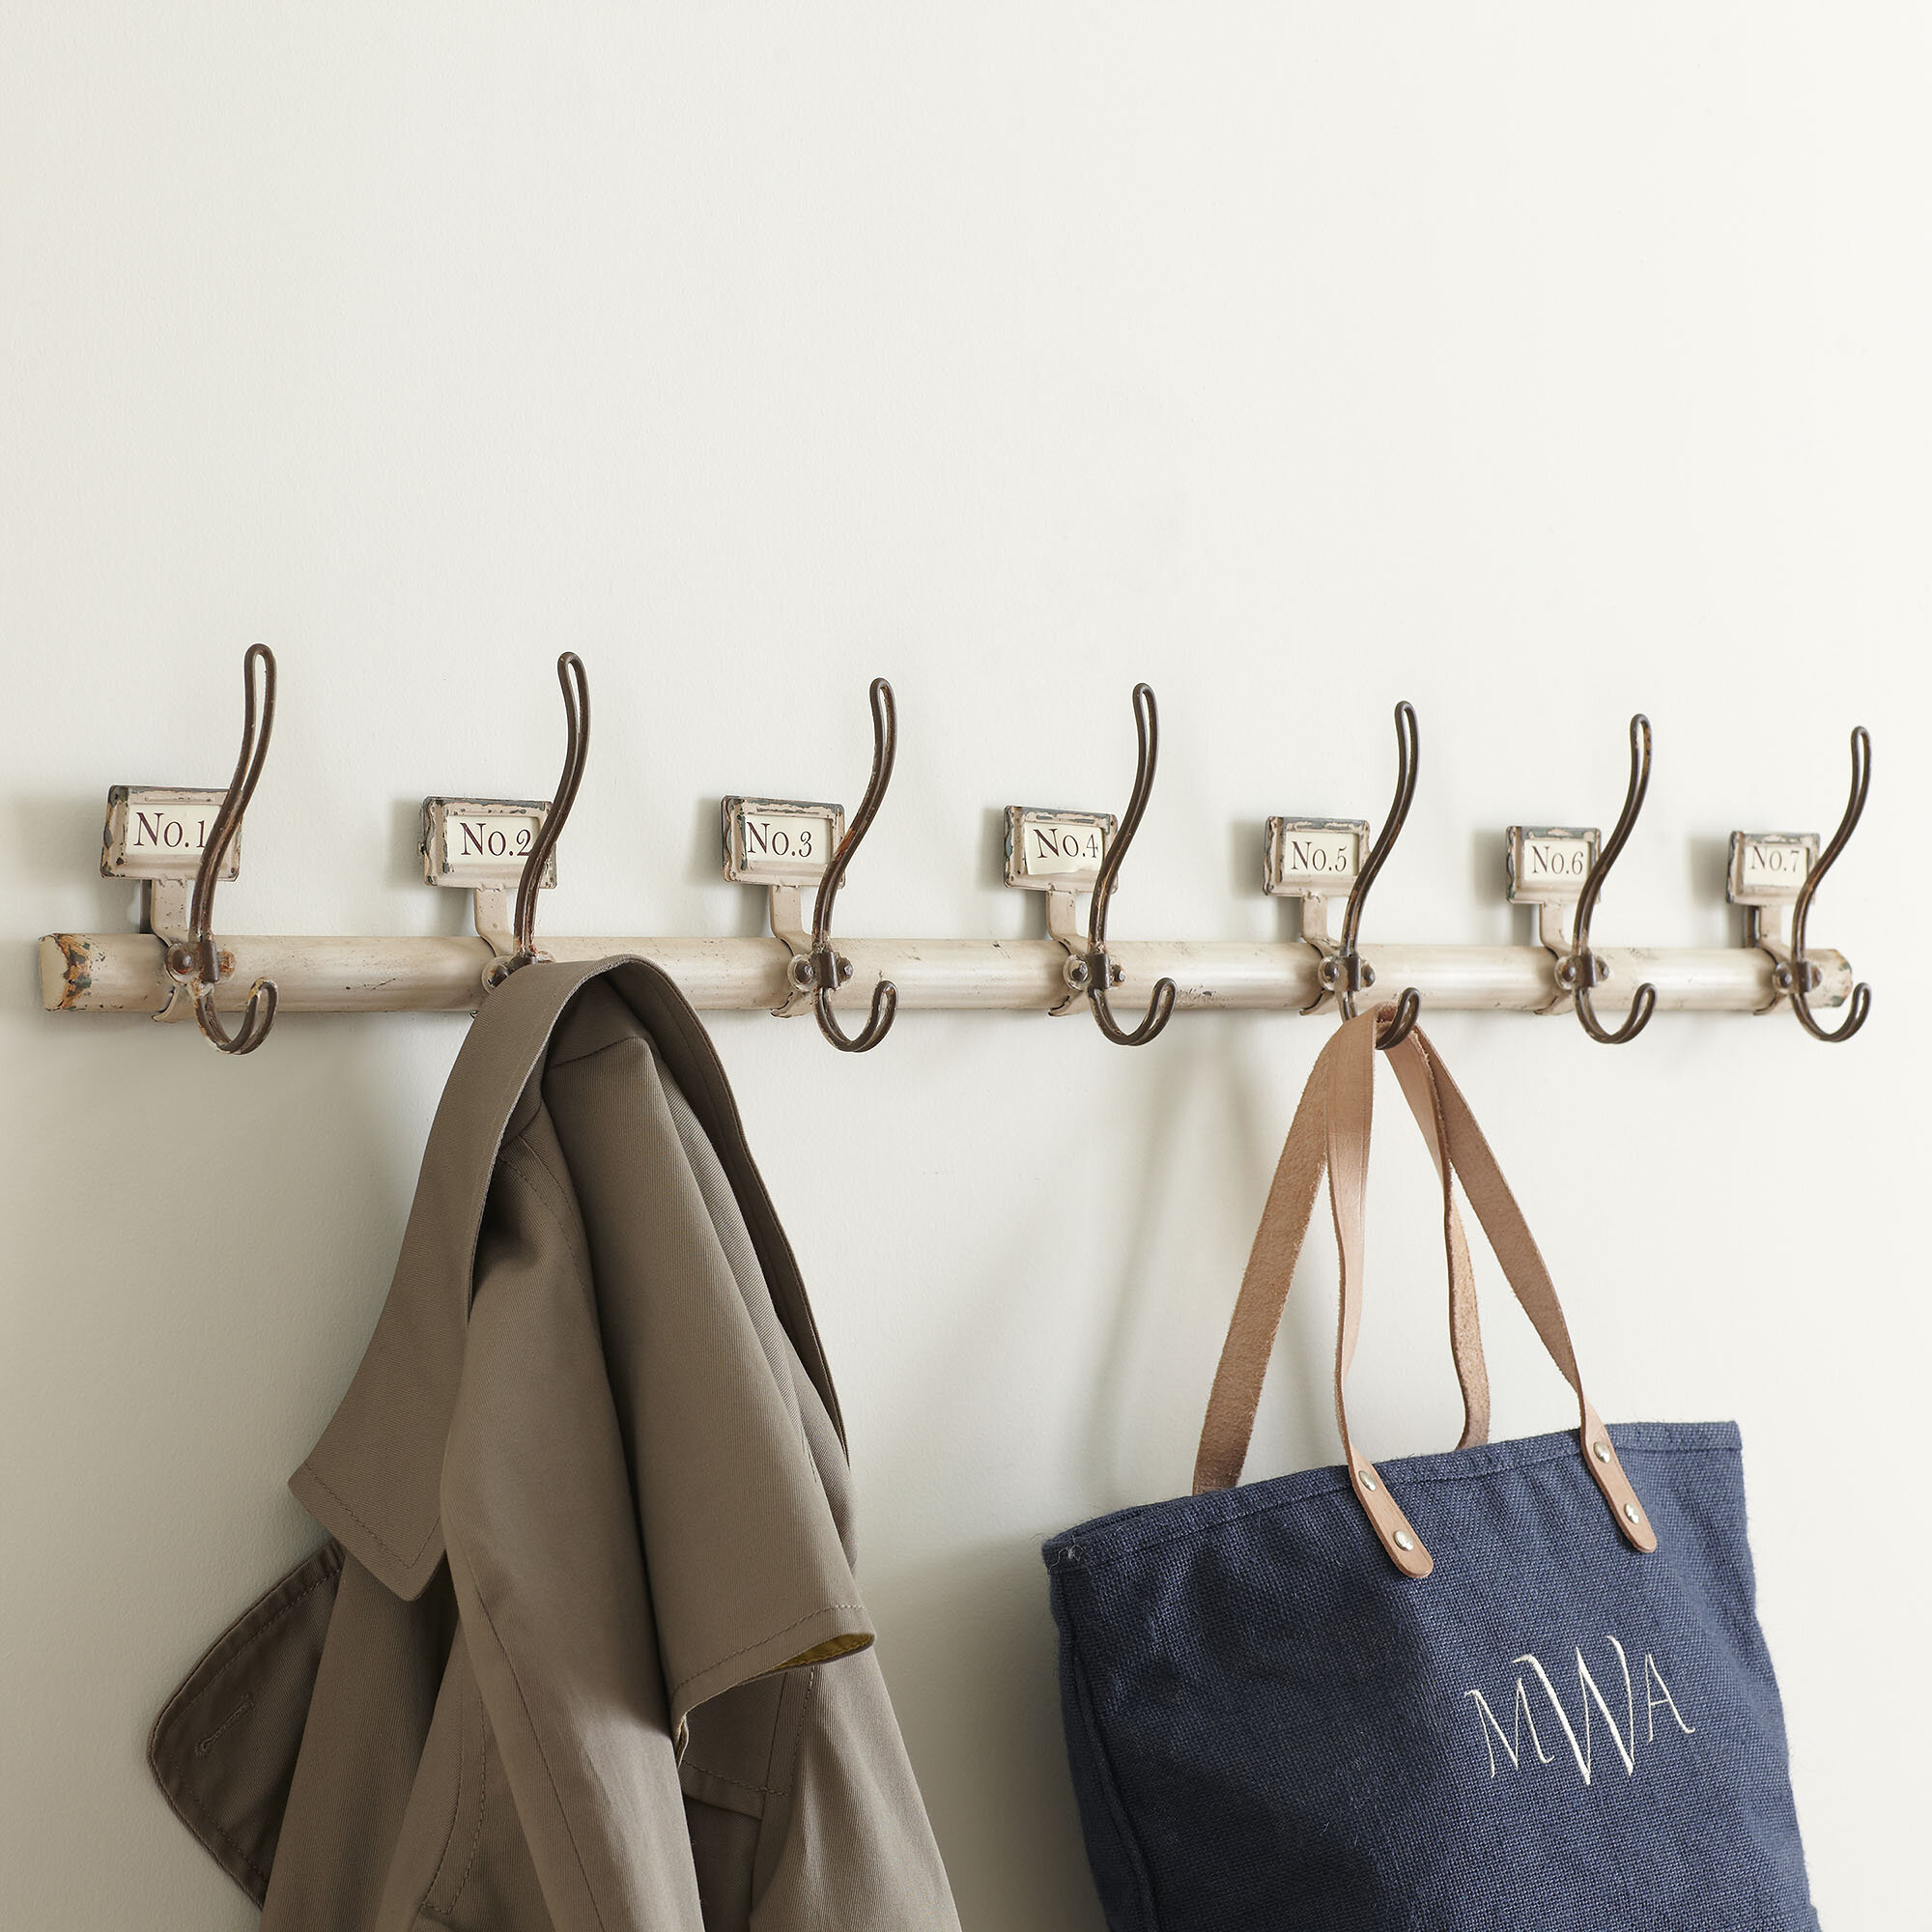 edge ocean theme tree cuttingedgemetalsinccom inc custom joist decor djhpt hangers picture decorative palm cutting metals